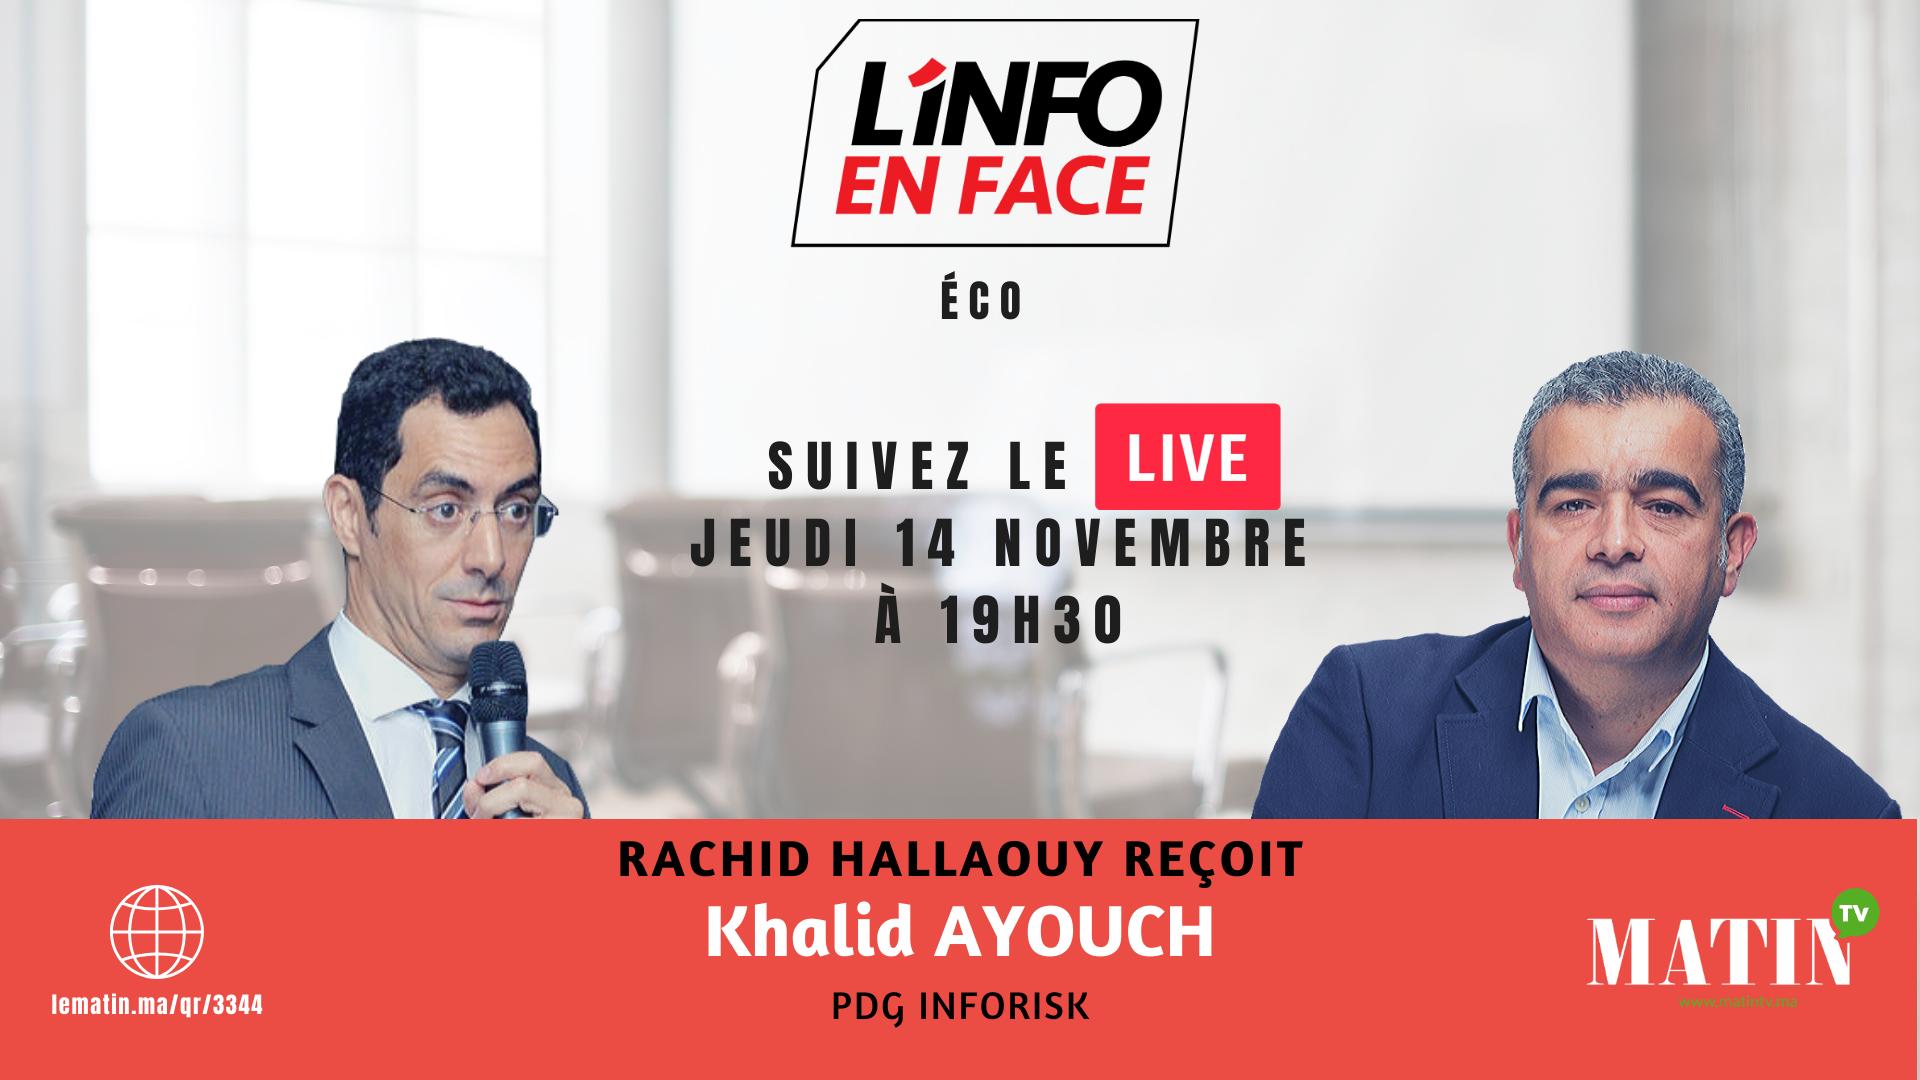 Live : L'Info en Face avec Khalid Ayouch, PDG Inforisk